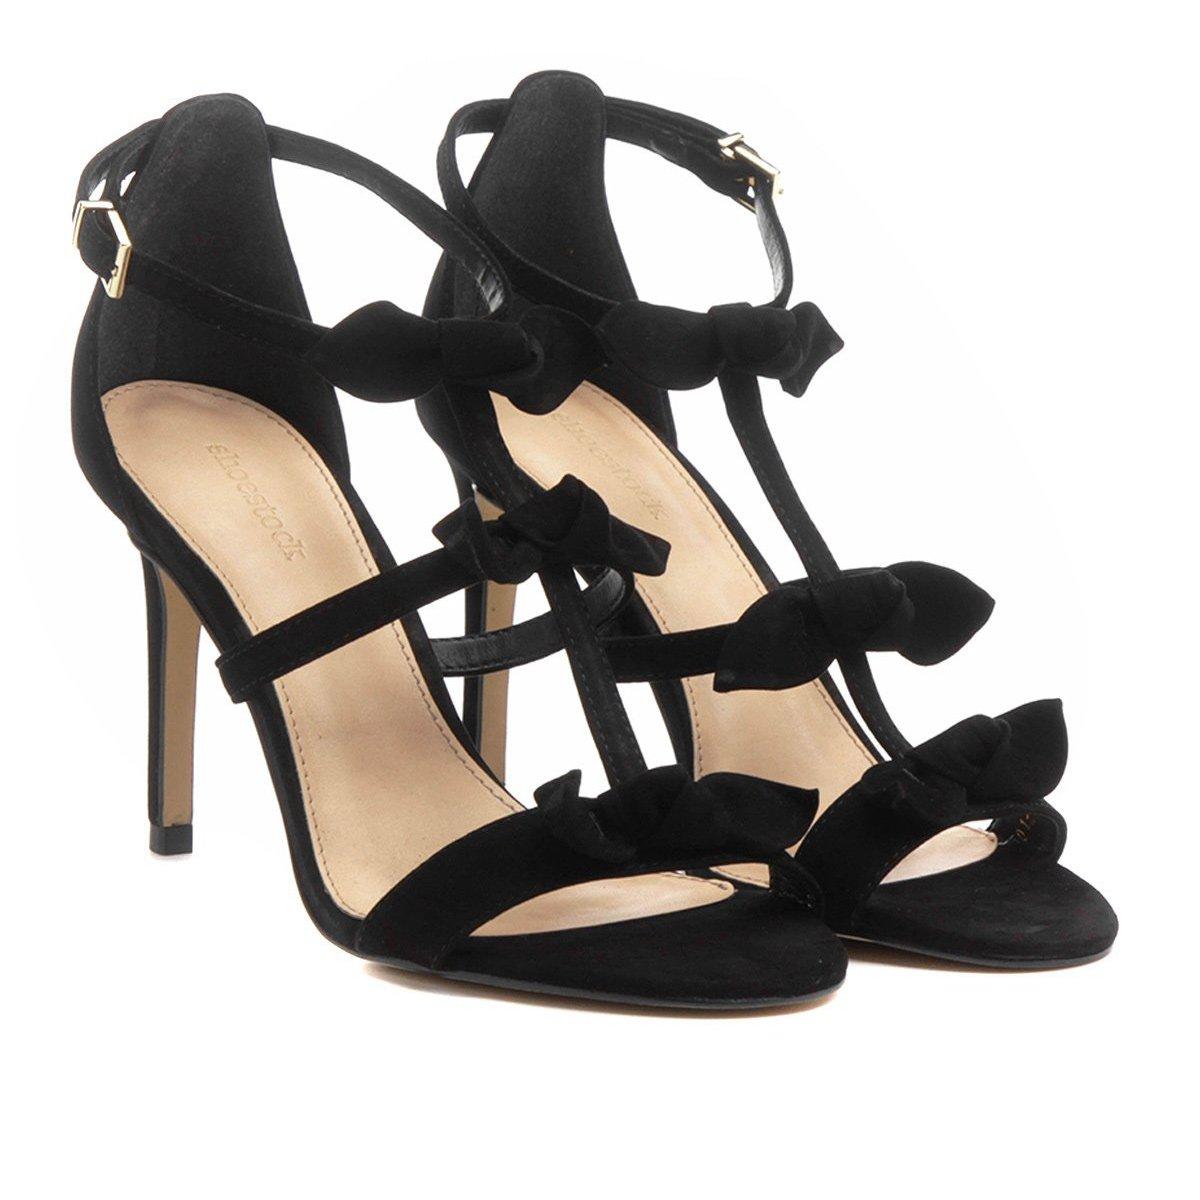 cc7be08abb Sandália Couro Shoestock Salto Fino Nós Feminina